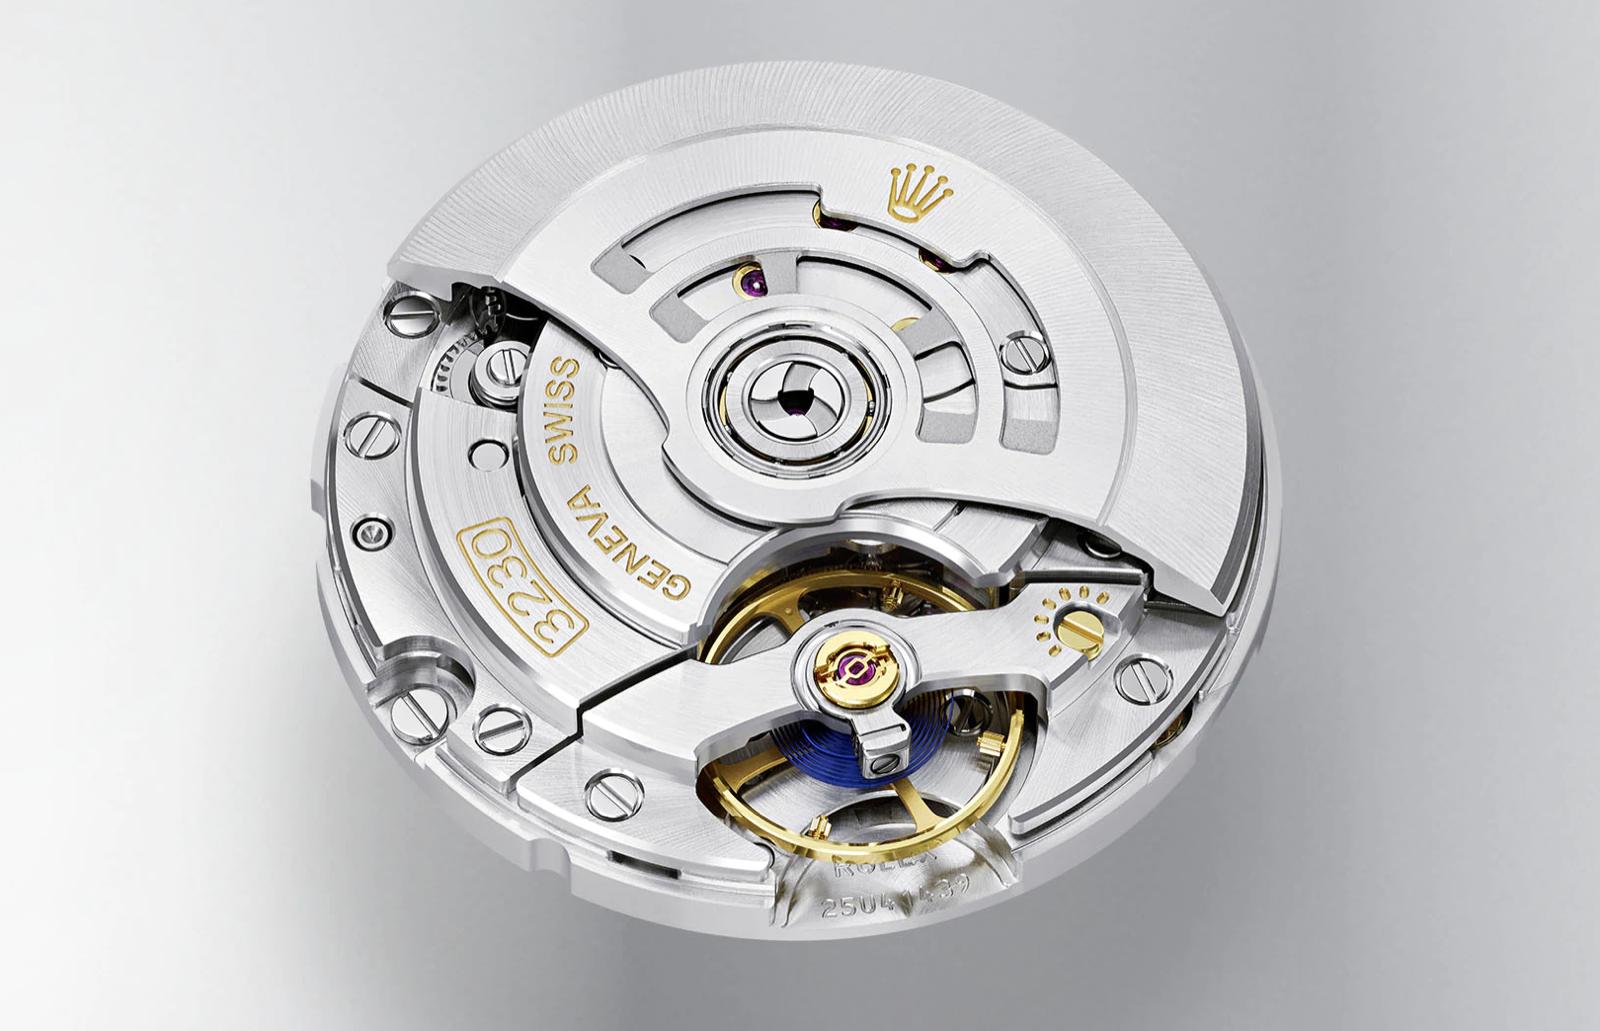 Calibre 3230 Rolex